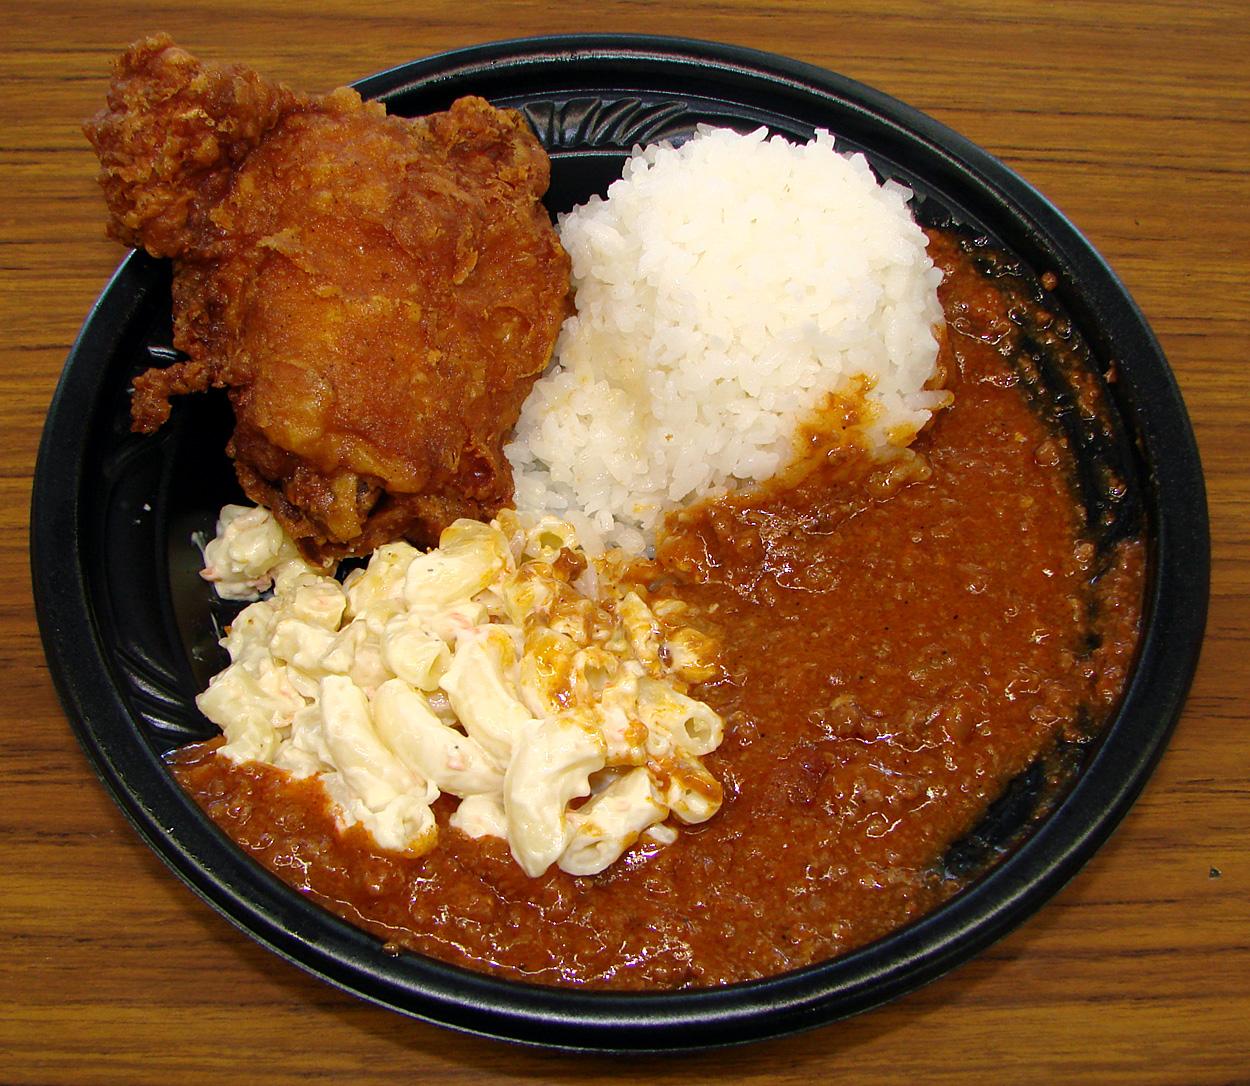 Kaukau Time Kaukau Is A Hawaiian Pidgin Slang Word Meaning Food Or To Eat Zippy S Chili Recipe